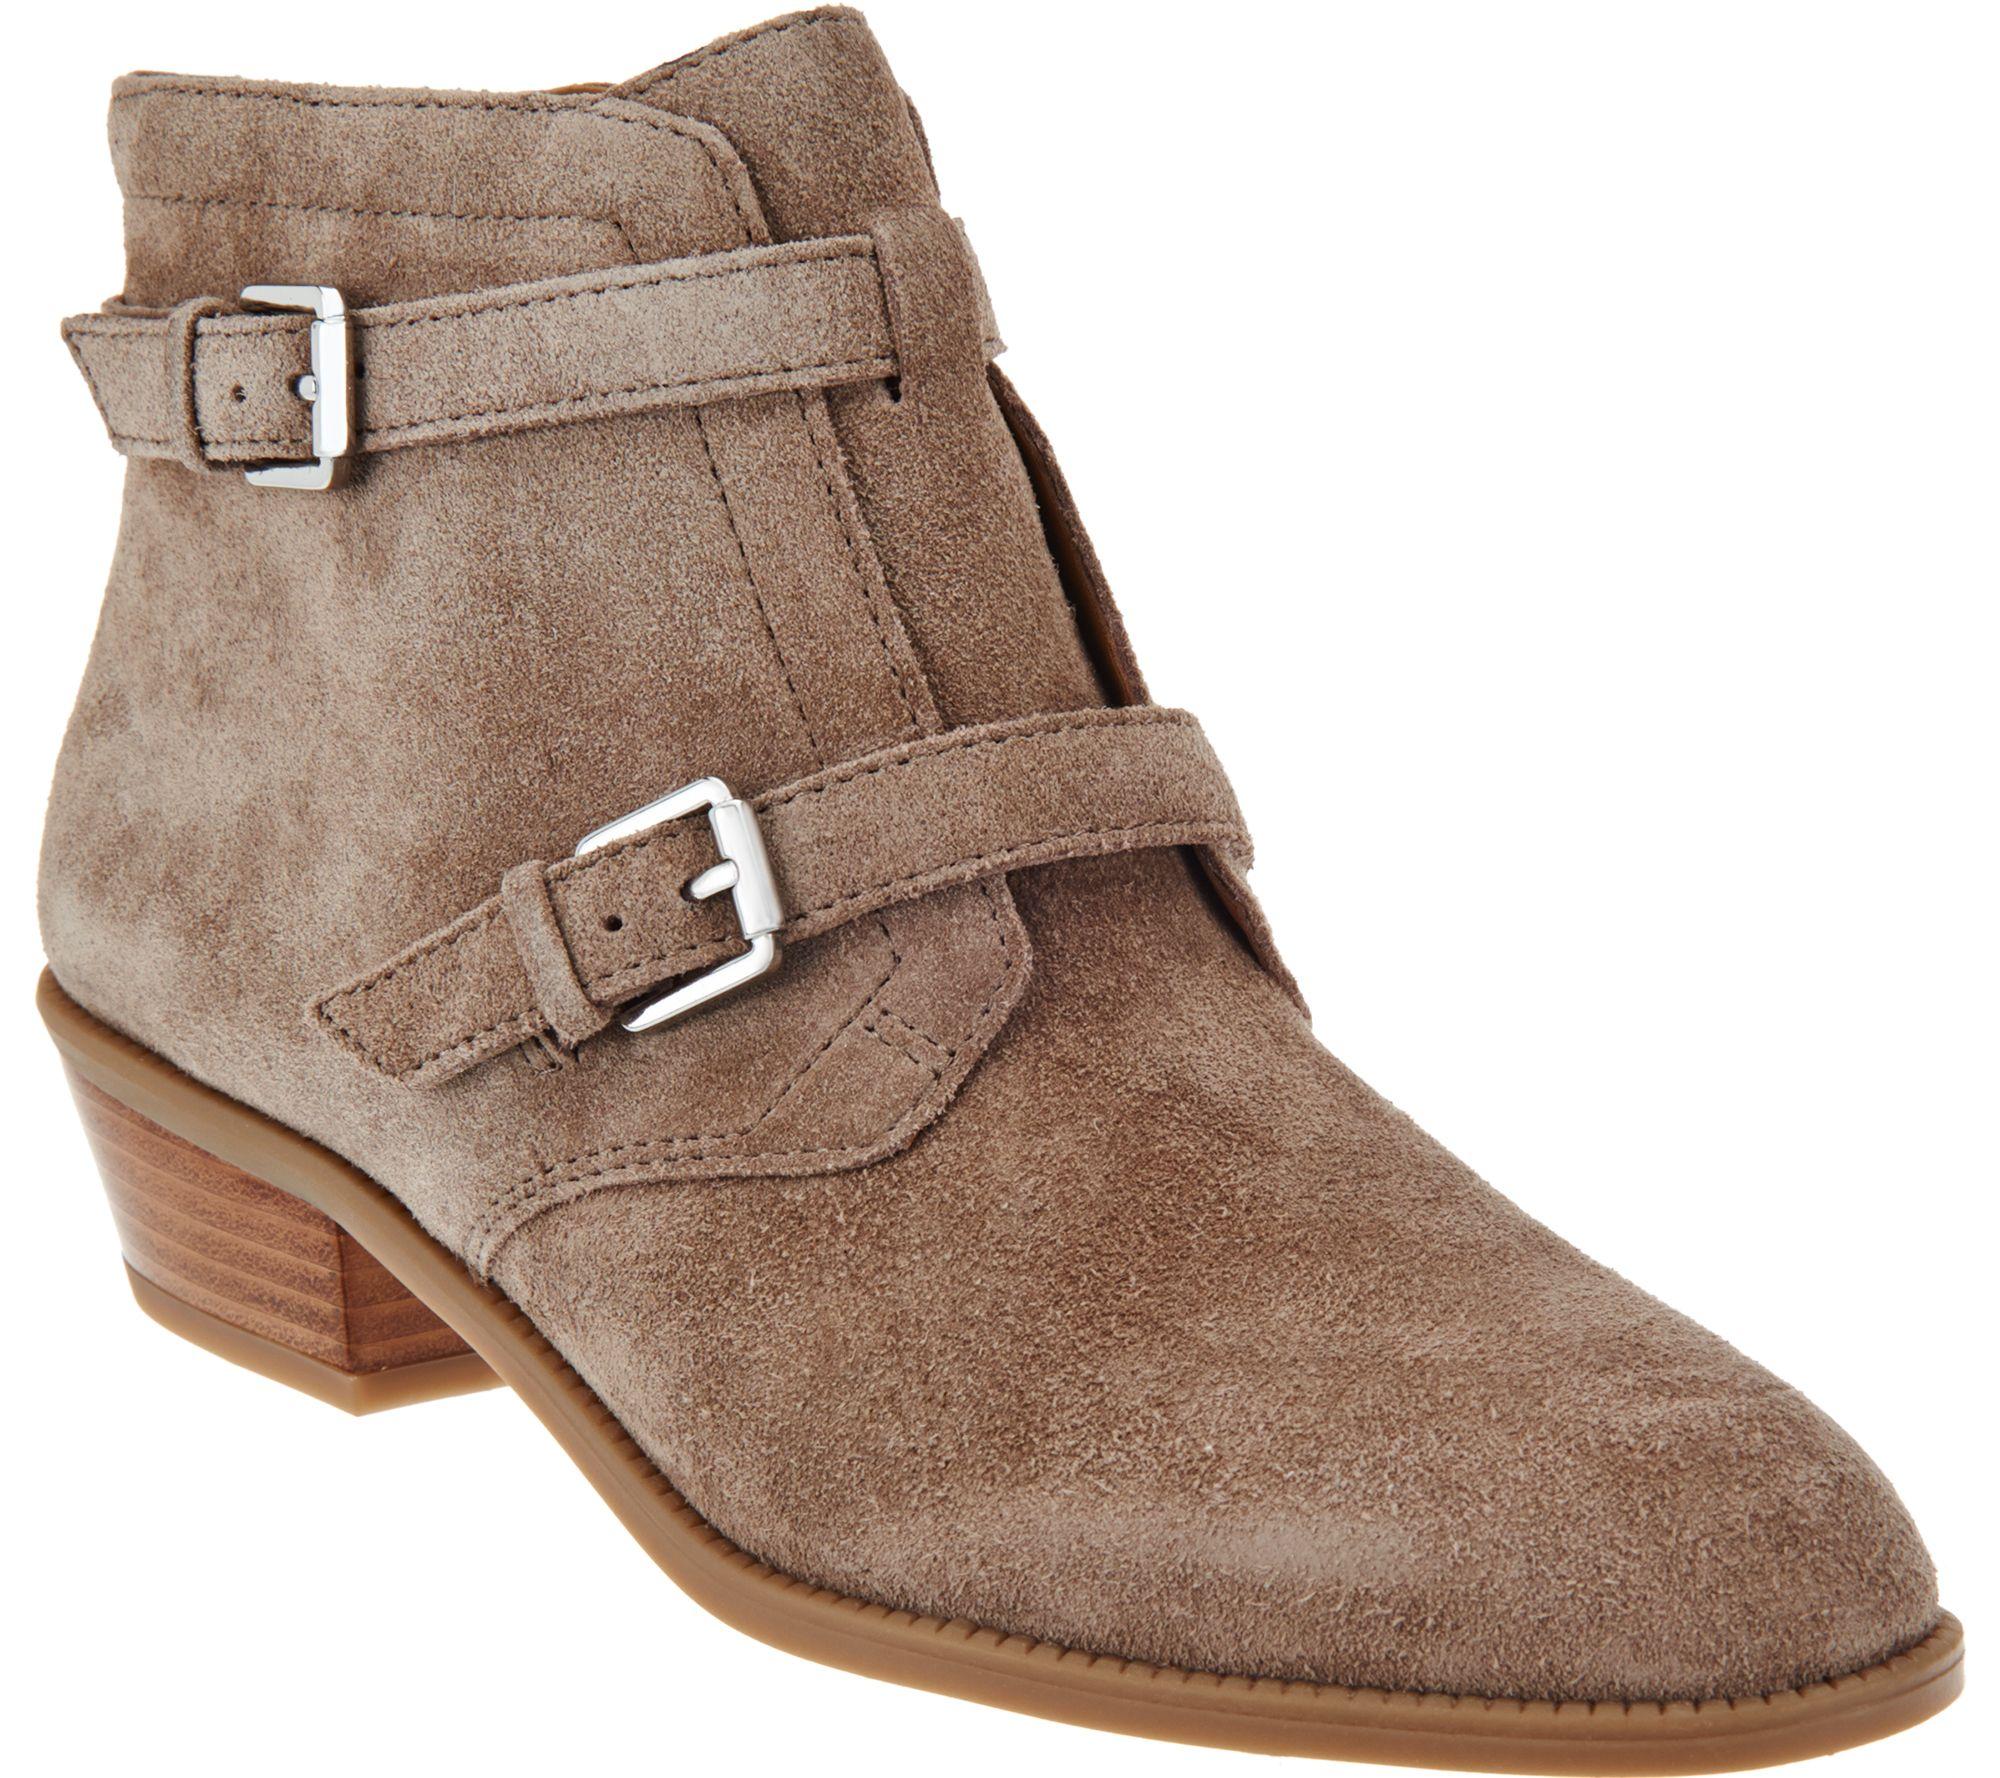 a50439d87dc Franco Sarto Suede Ankle Boots w  Buckle Detail - Rynn - Page 1 — QVC.com